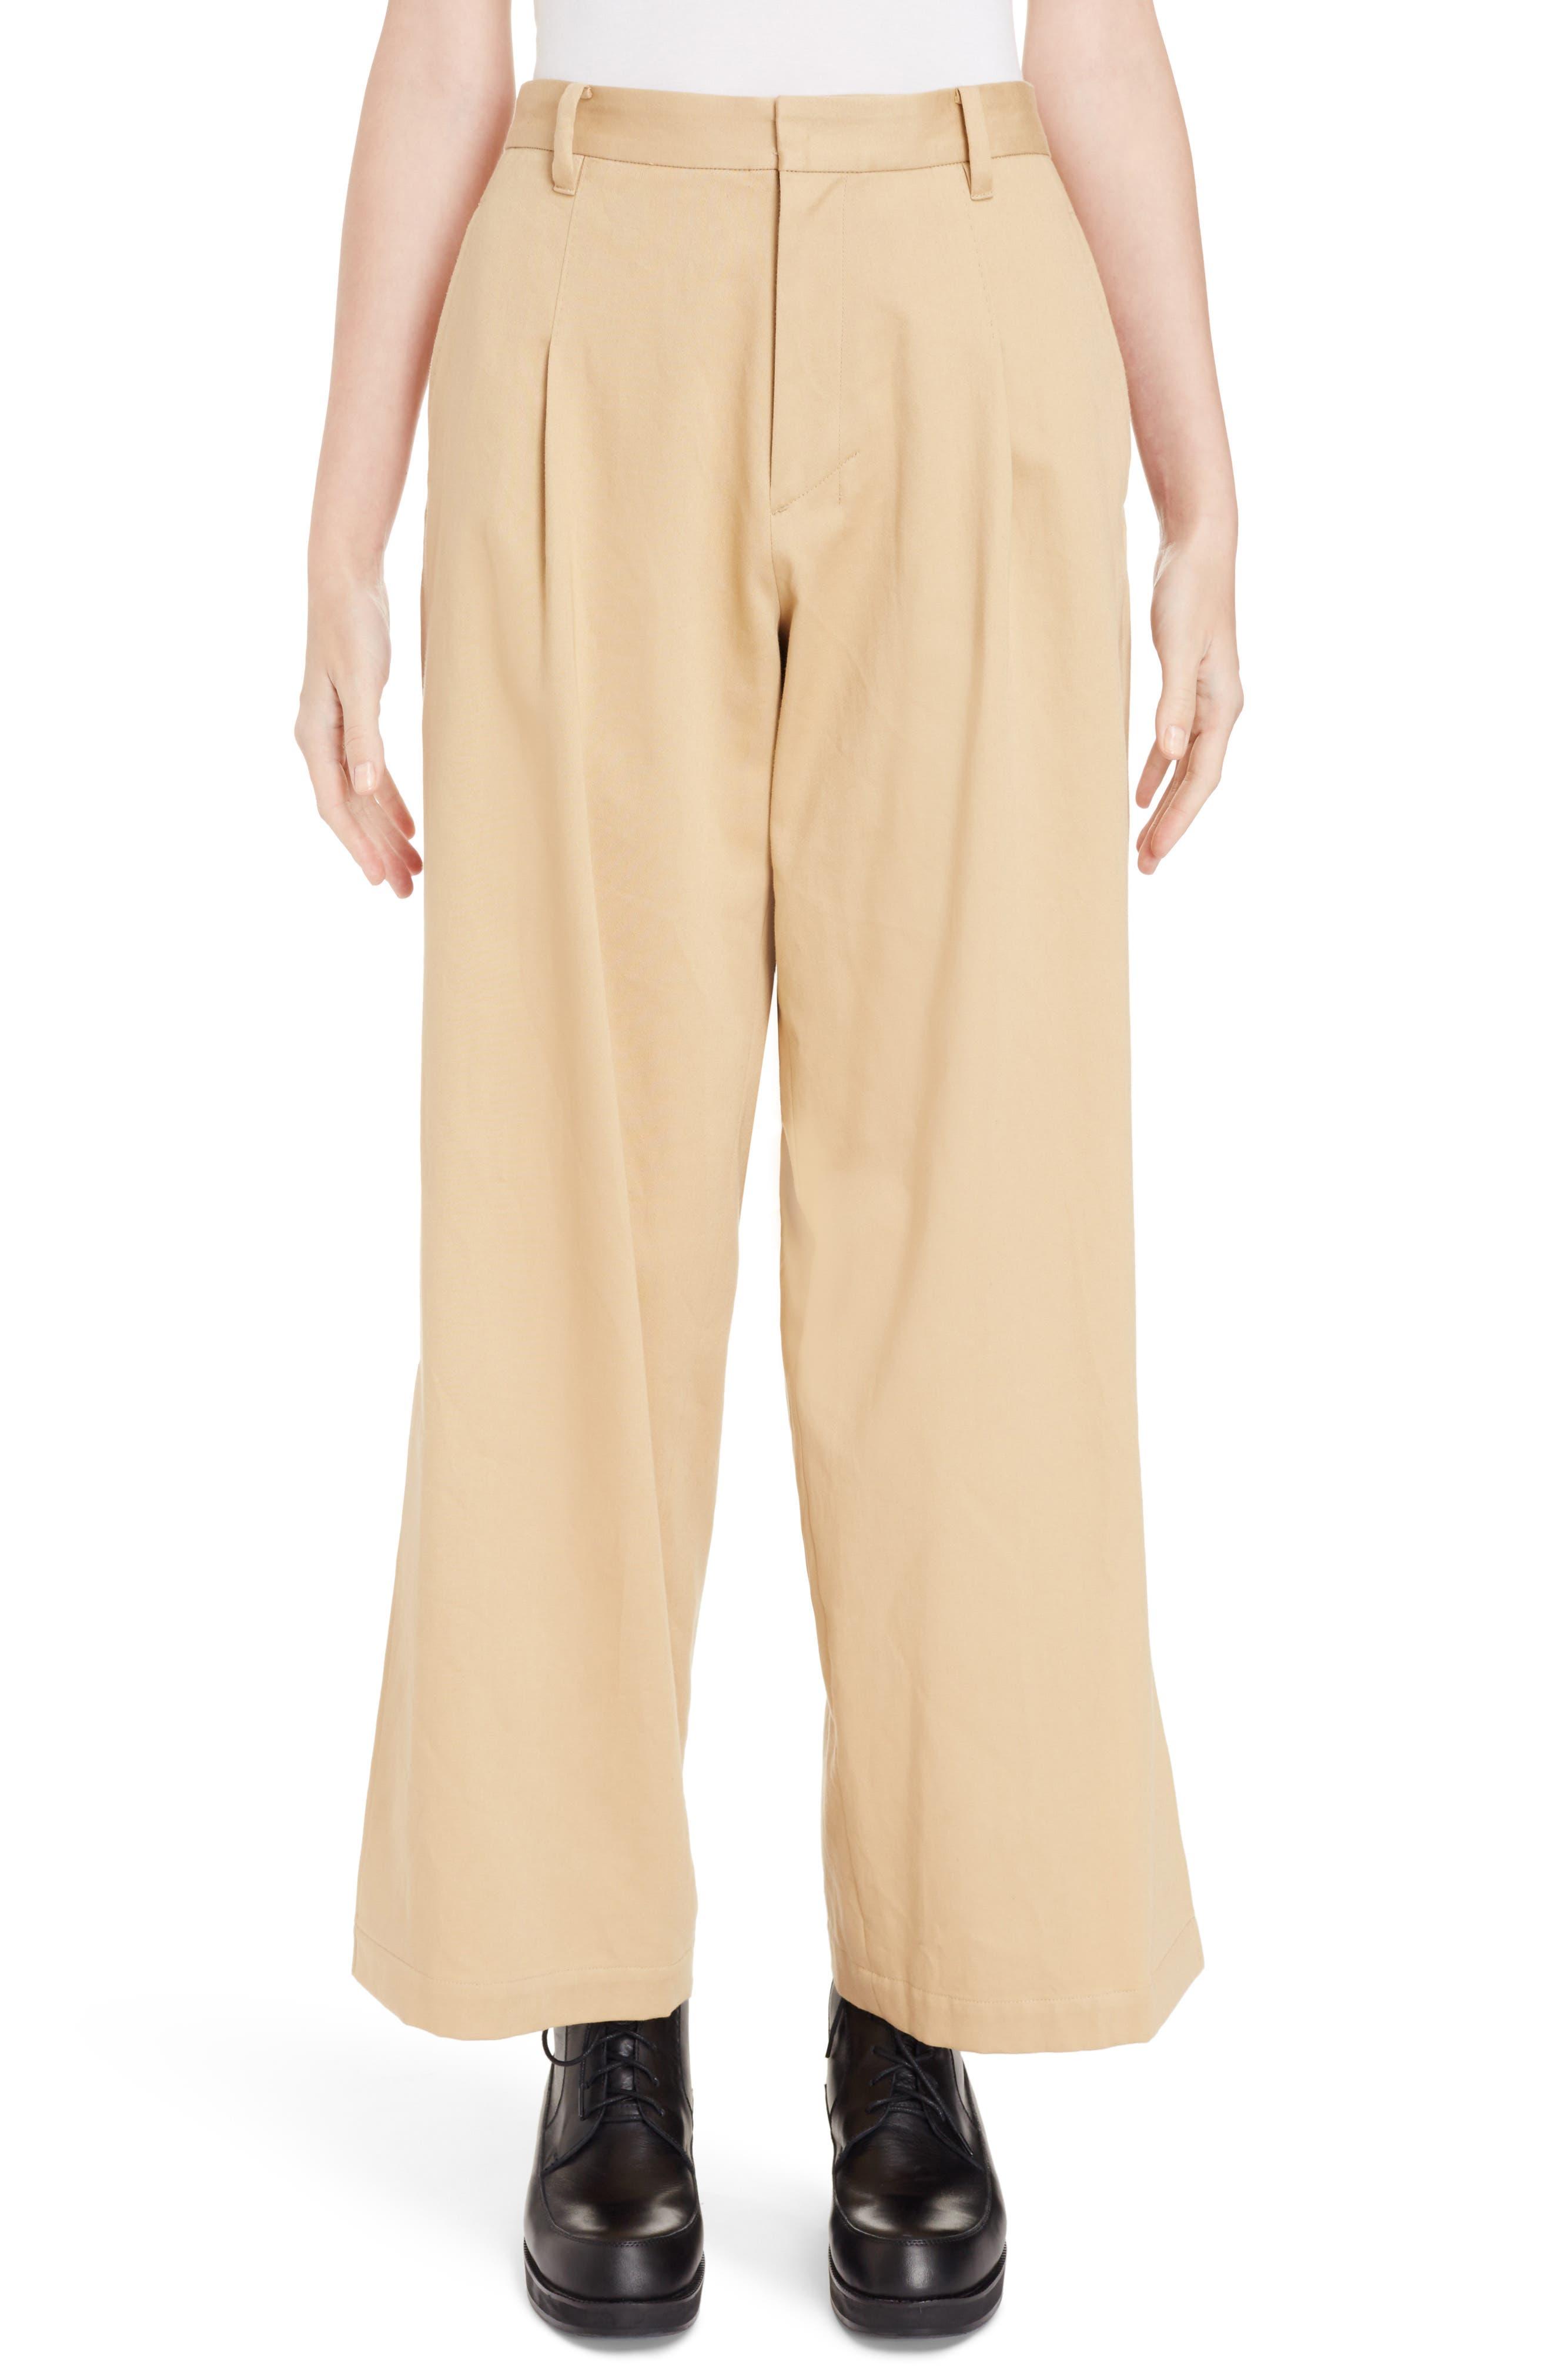 Y's by Yohji Yamamoto Pleated Split Hem Pants